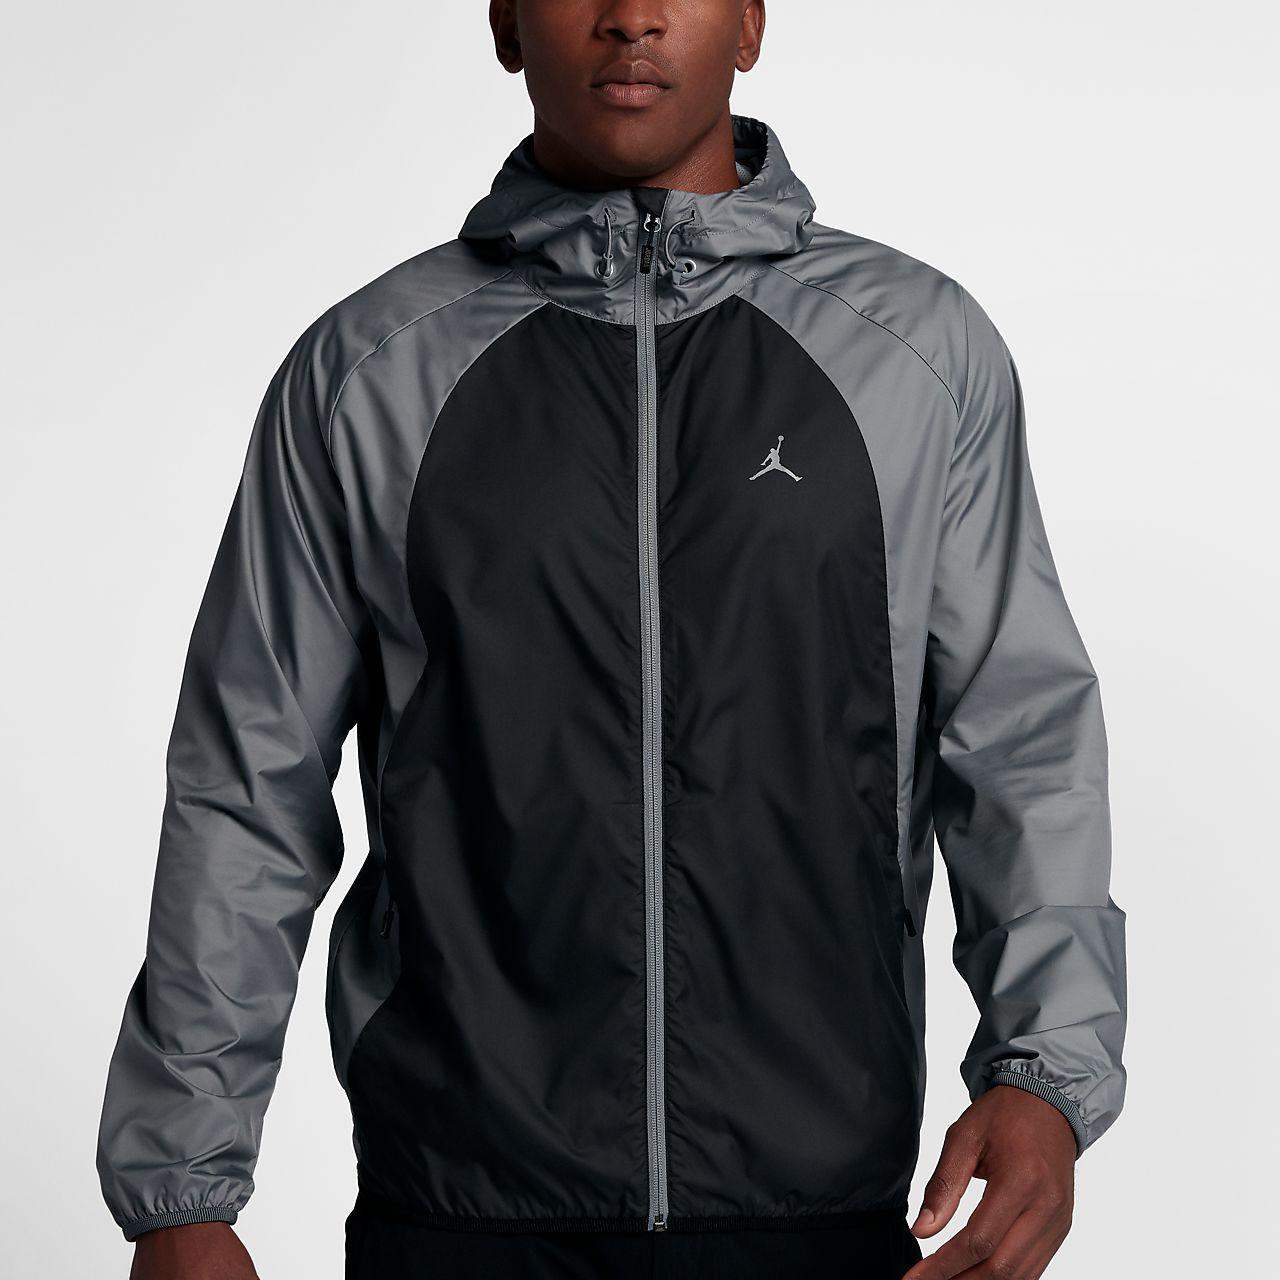 reputable site 70a3f 5a859 Jordan Sportswear Wings Windbreaker Menu0026 39 s Jacket. Nike.com